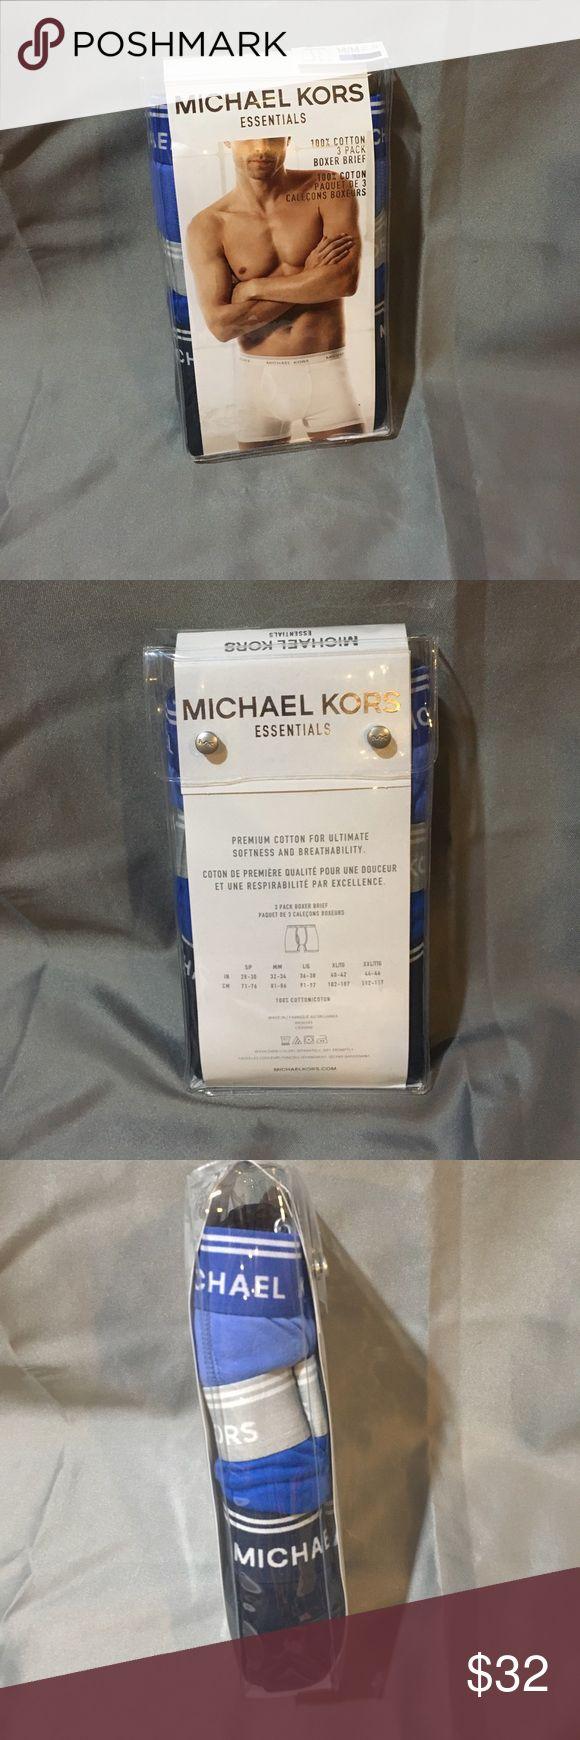 NWT Michael Kors Essentials Boxer Brief 3 pack NWT Michael Kors Essentials Boxer Brief 3 pack. Blue and black. Michael Kors Underwear & Socks Boxer Briefs